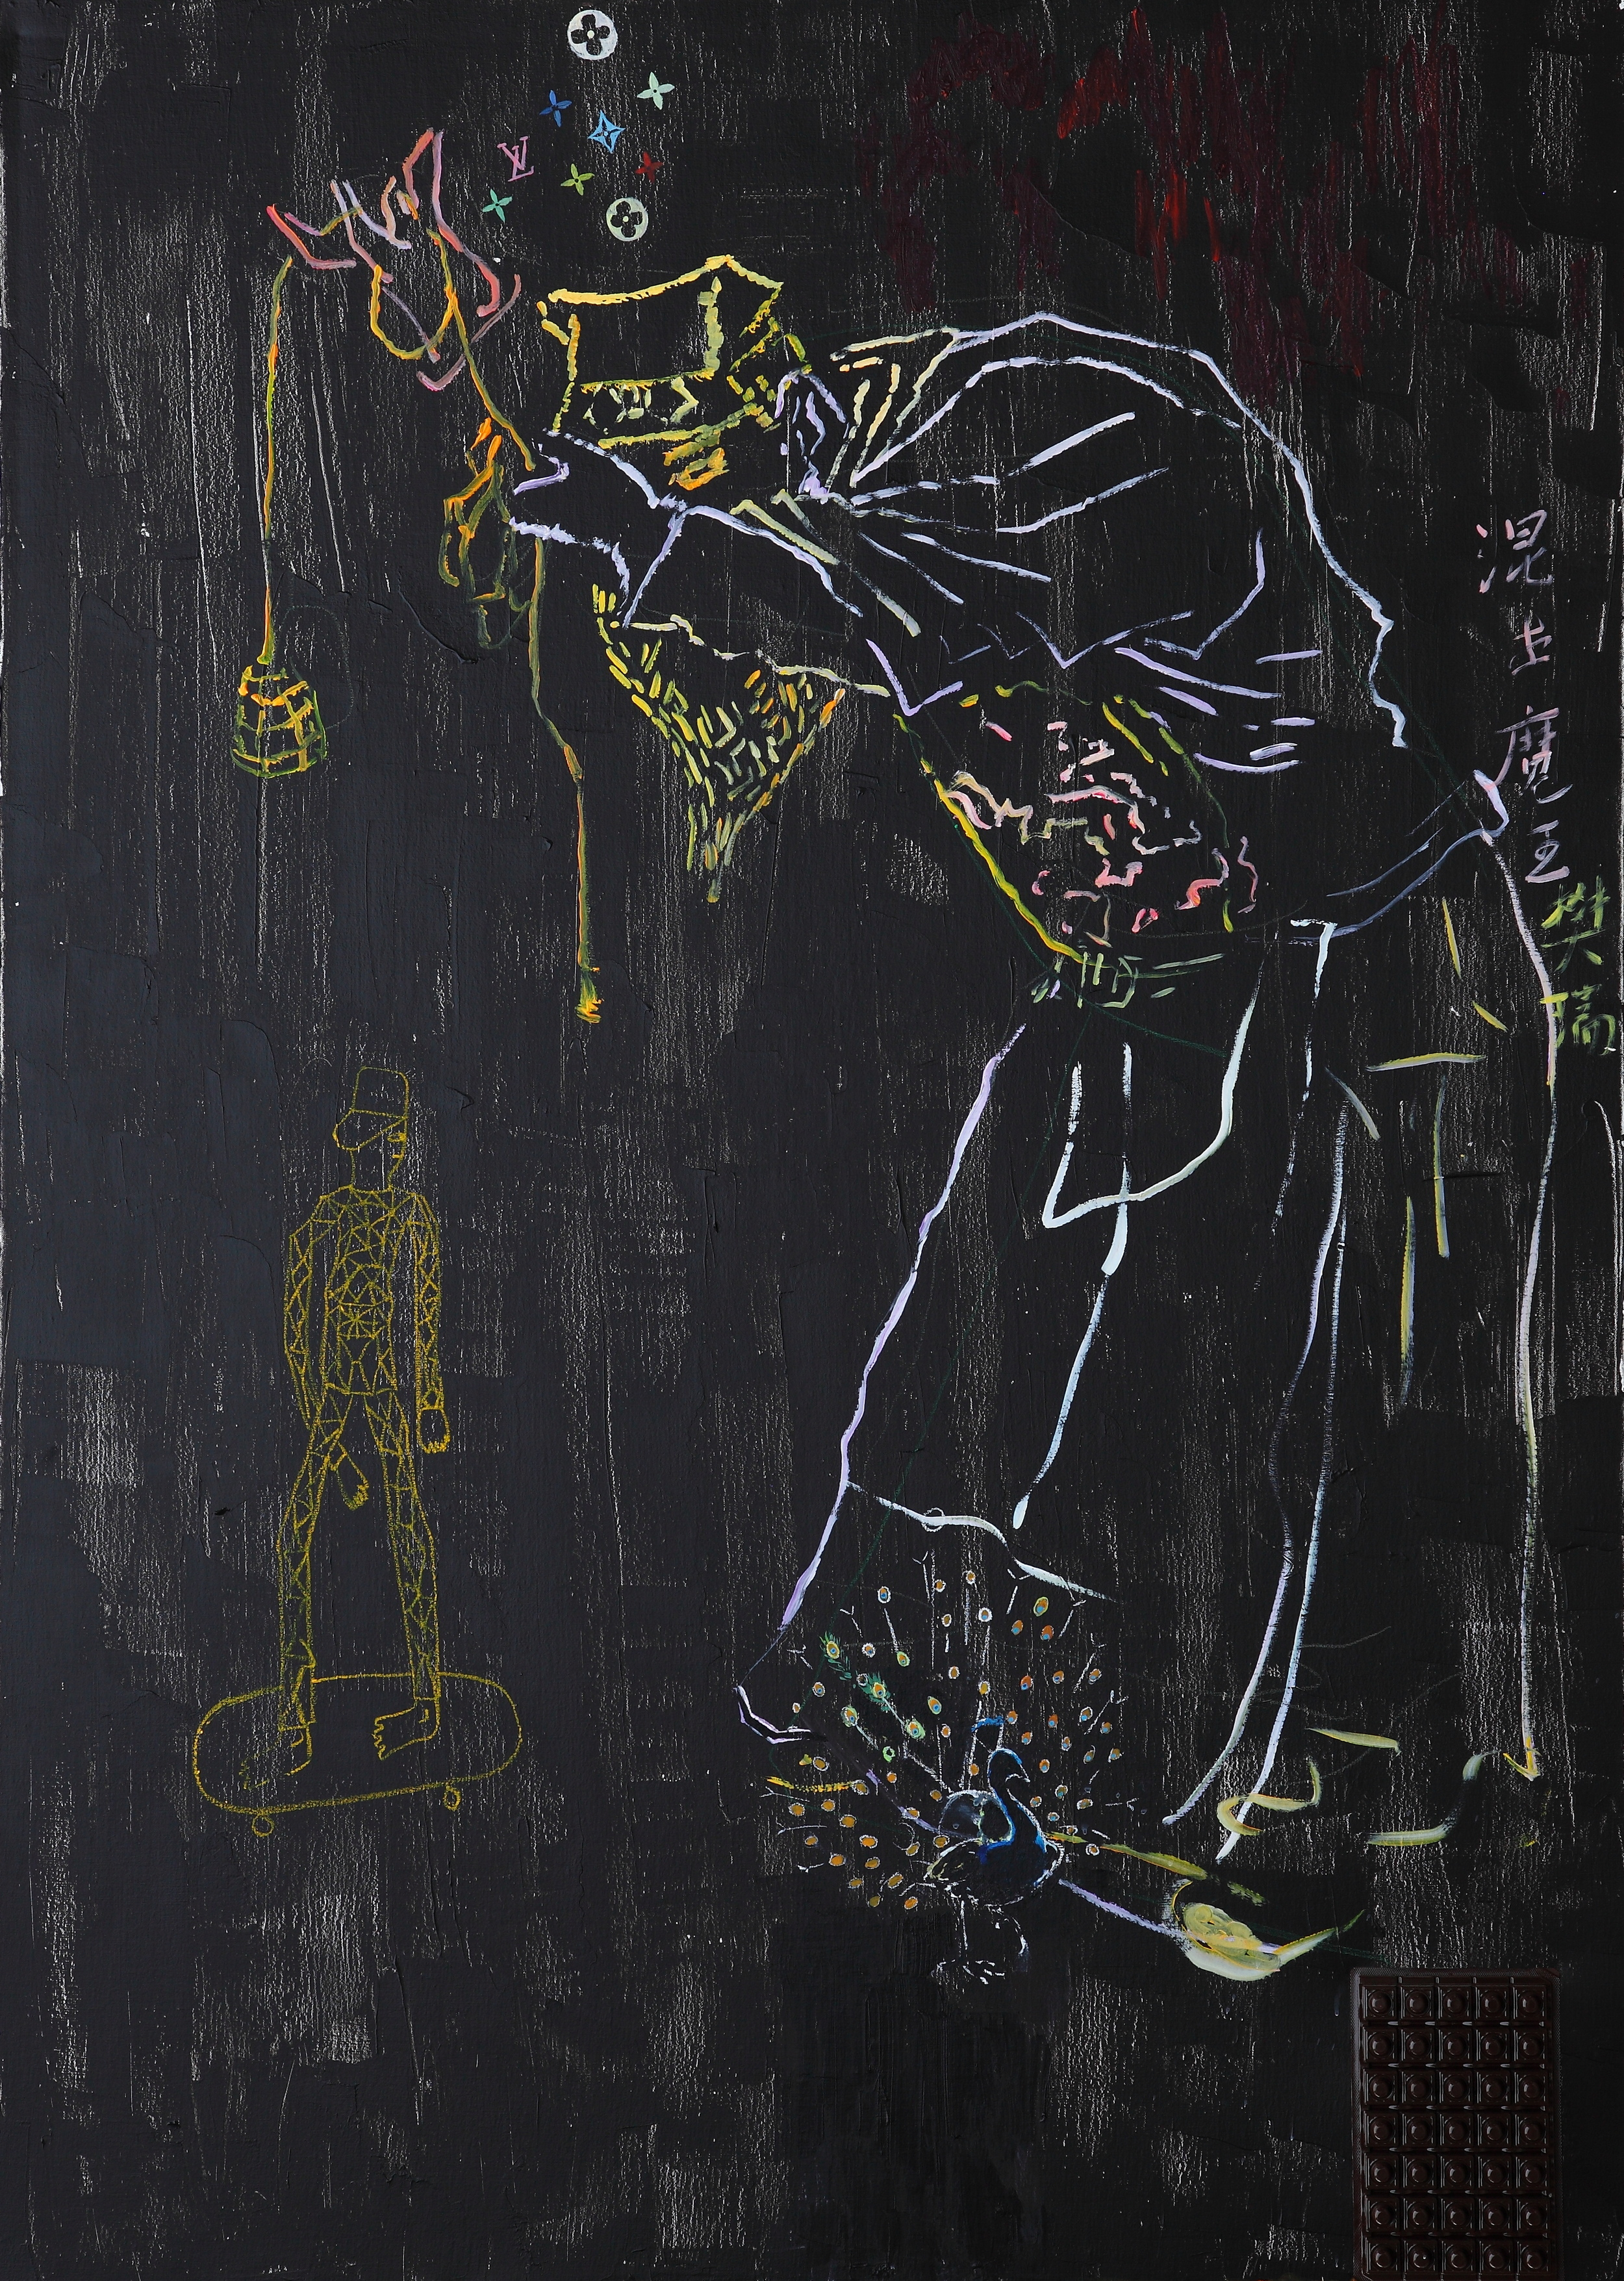 Shui hu , 2015 Mixed media on canvas 213x 152 cm